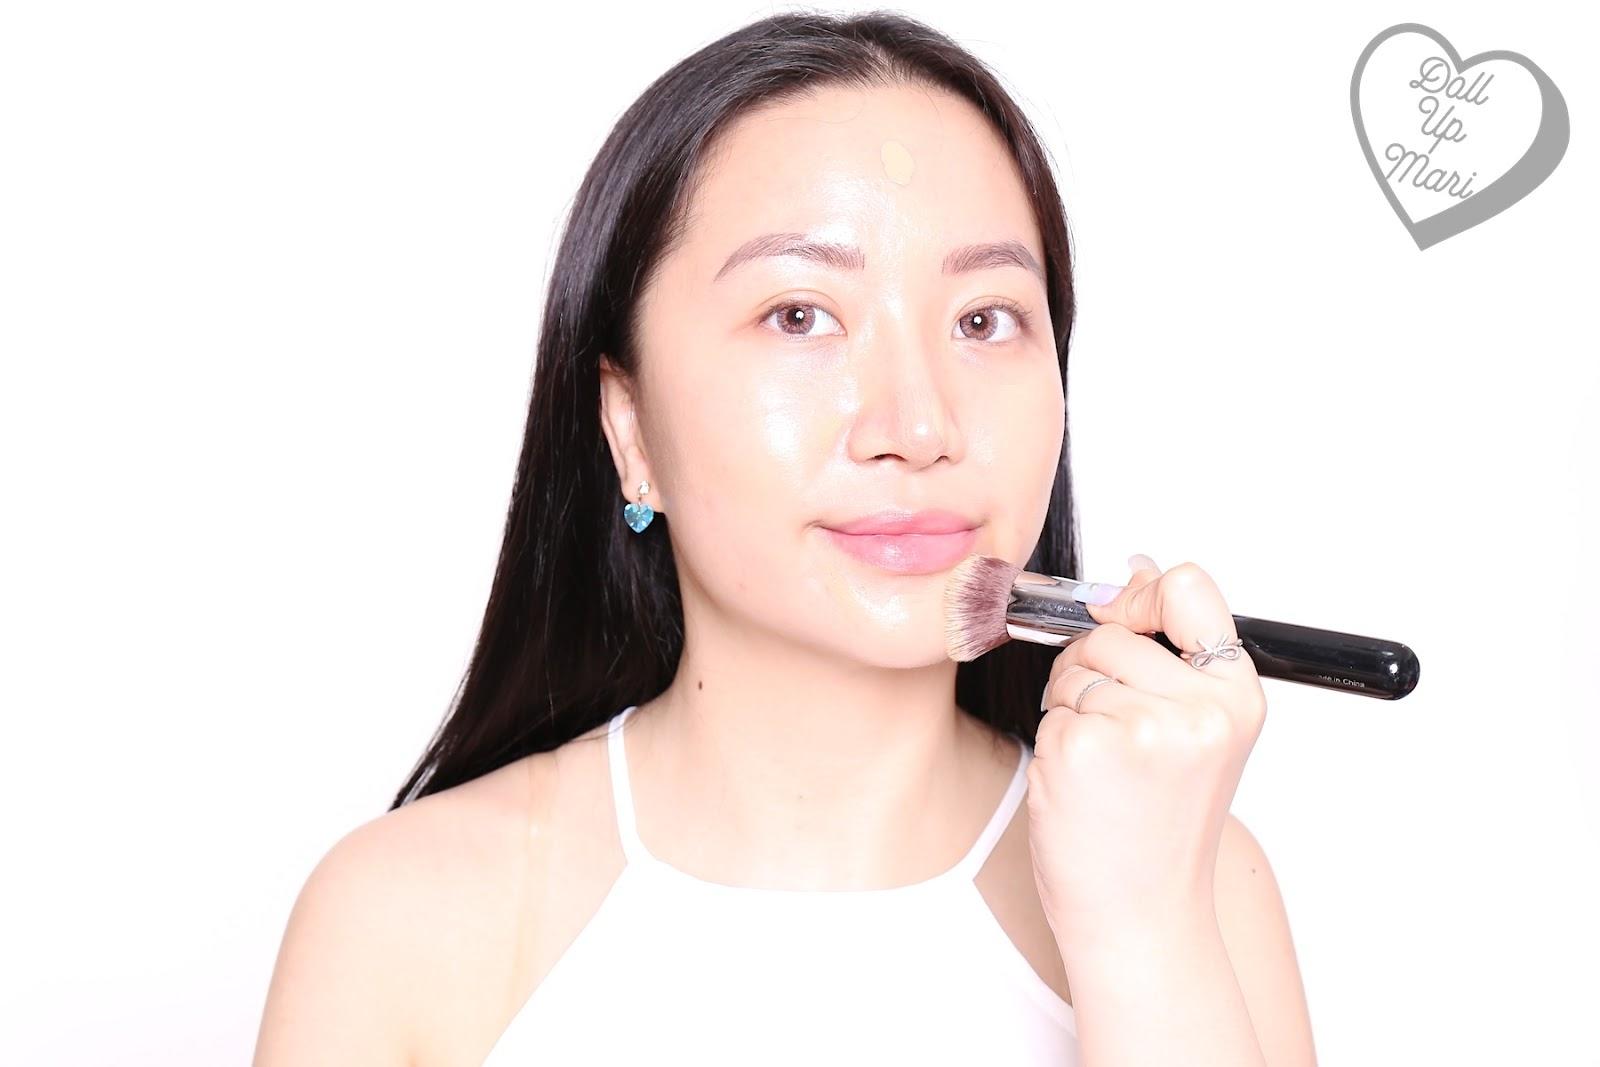 Blending L'Oréal Paris Infallible 24HR Fresh Wear Liquid Foundation SPF25PA+++ in shade Golden Beige using a kabuki brush